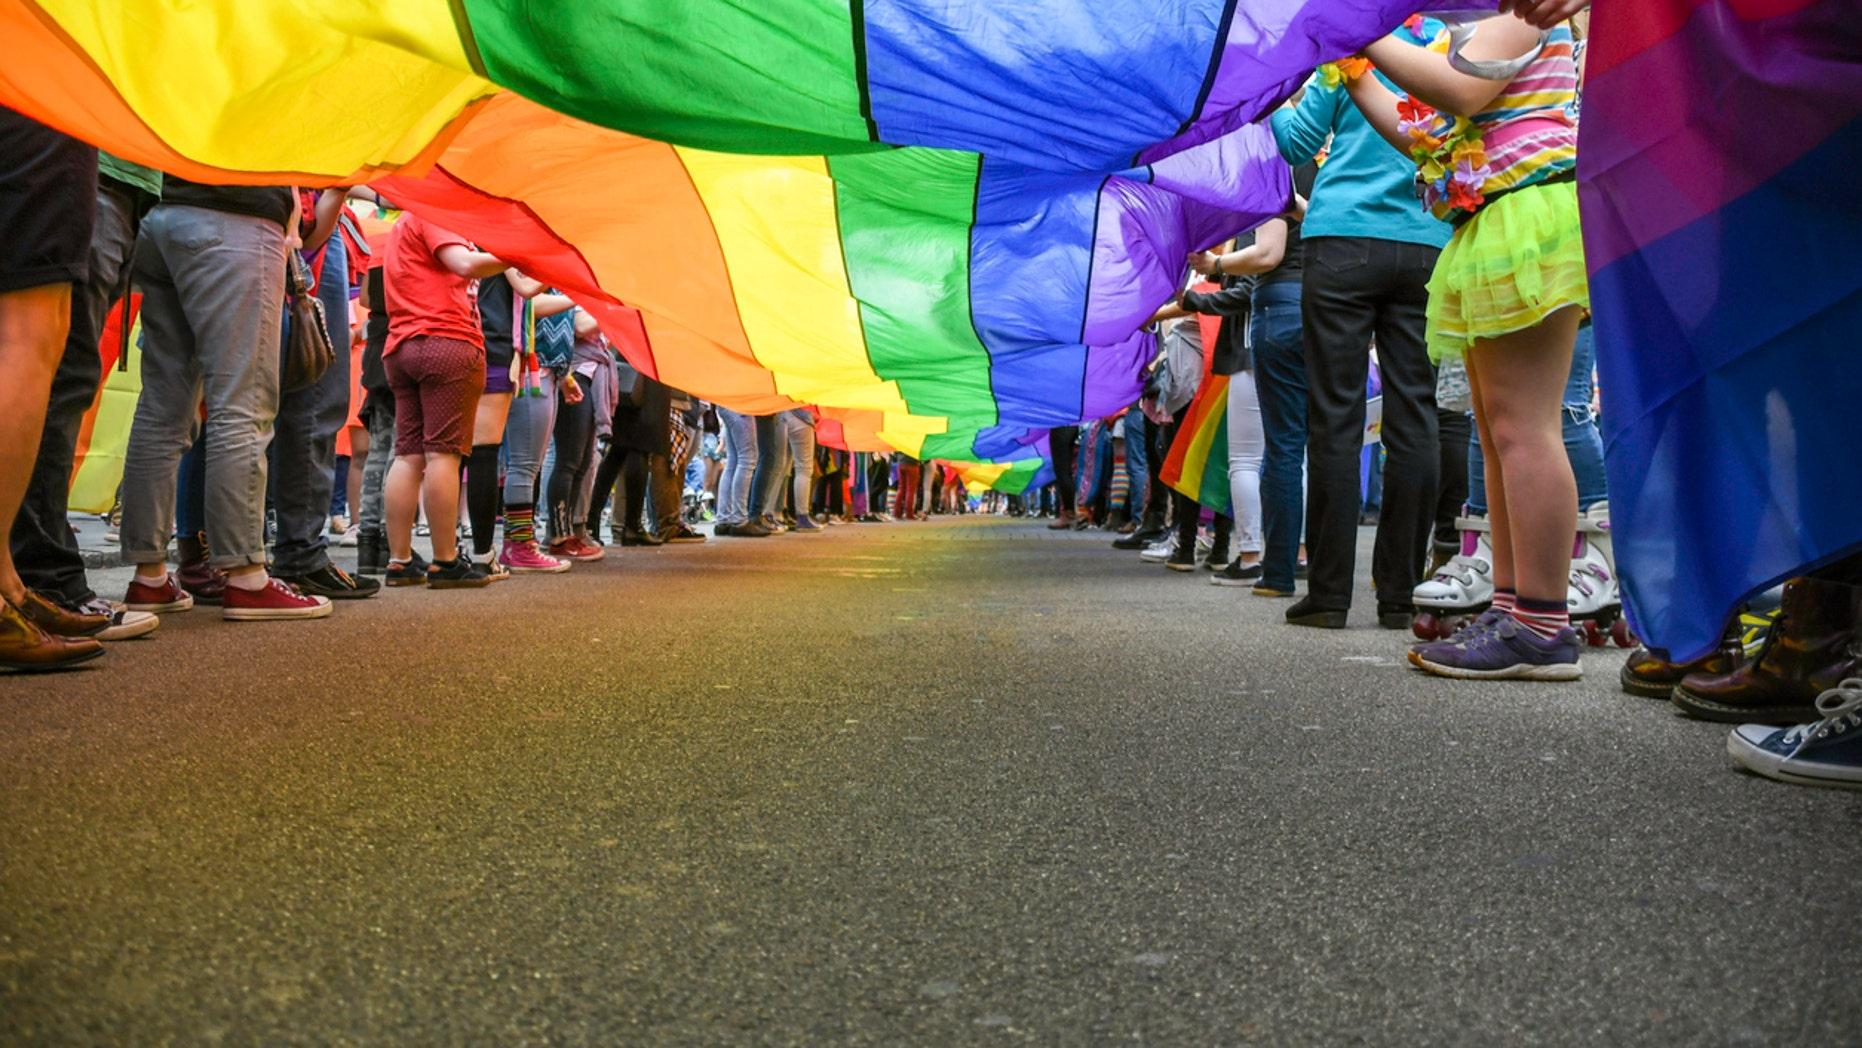 Under a LGBT Pride Flag, taken at Exeter Pride Parade, public event.